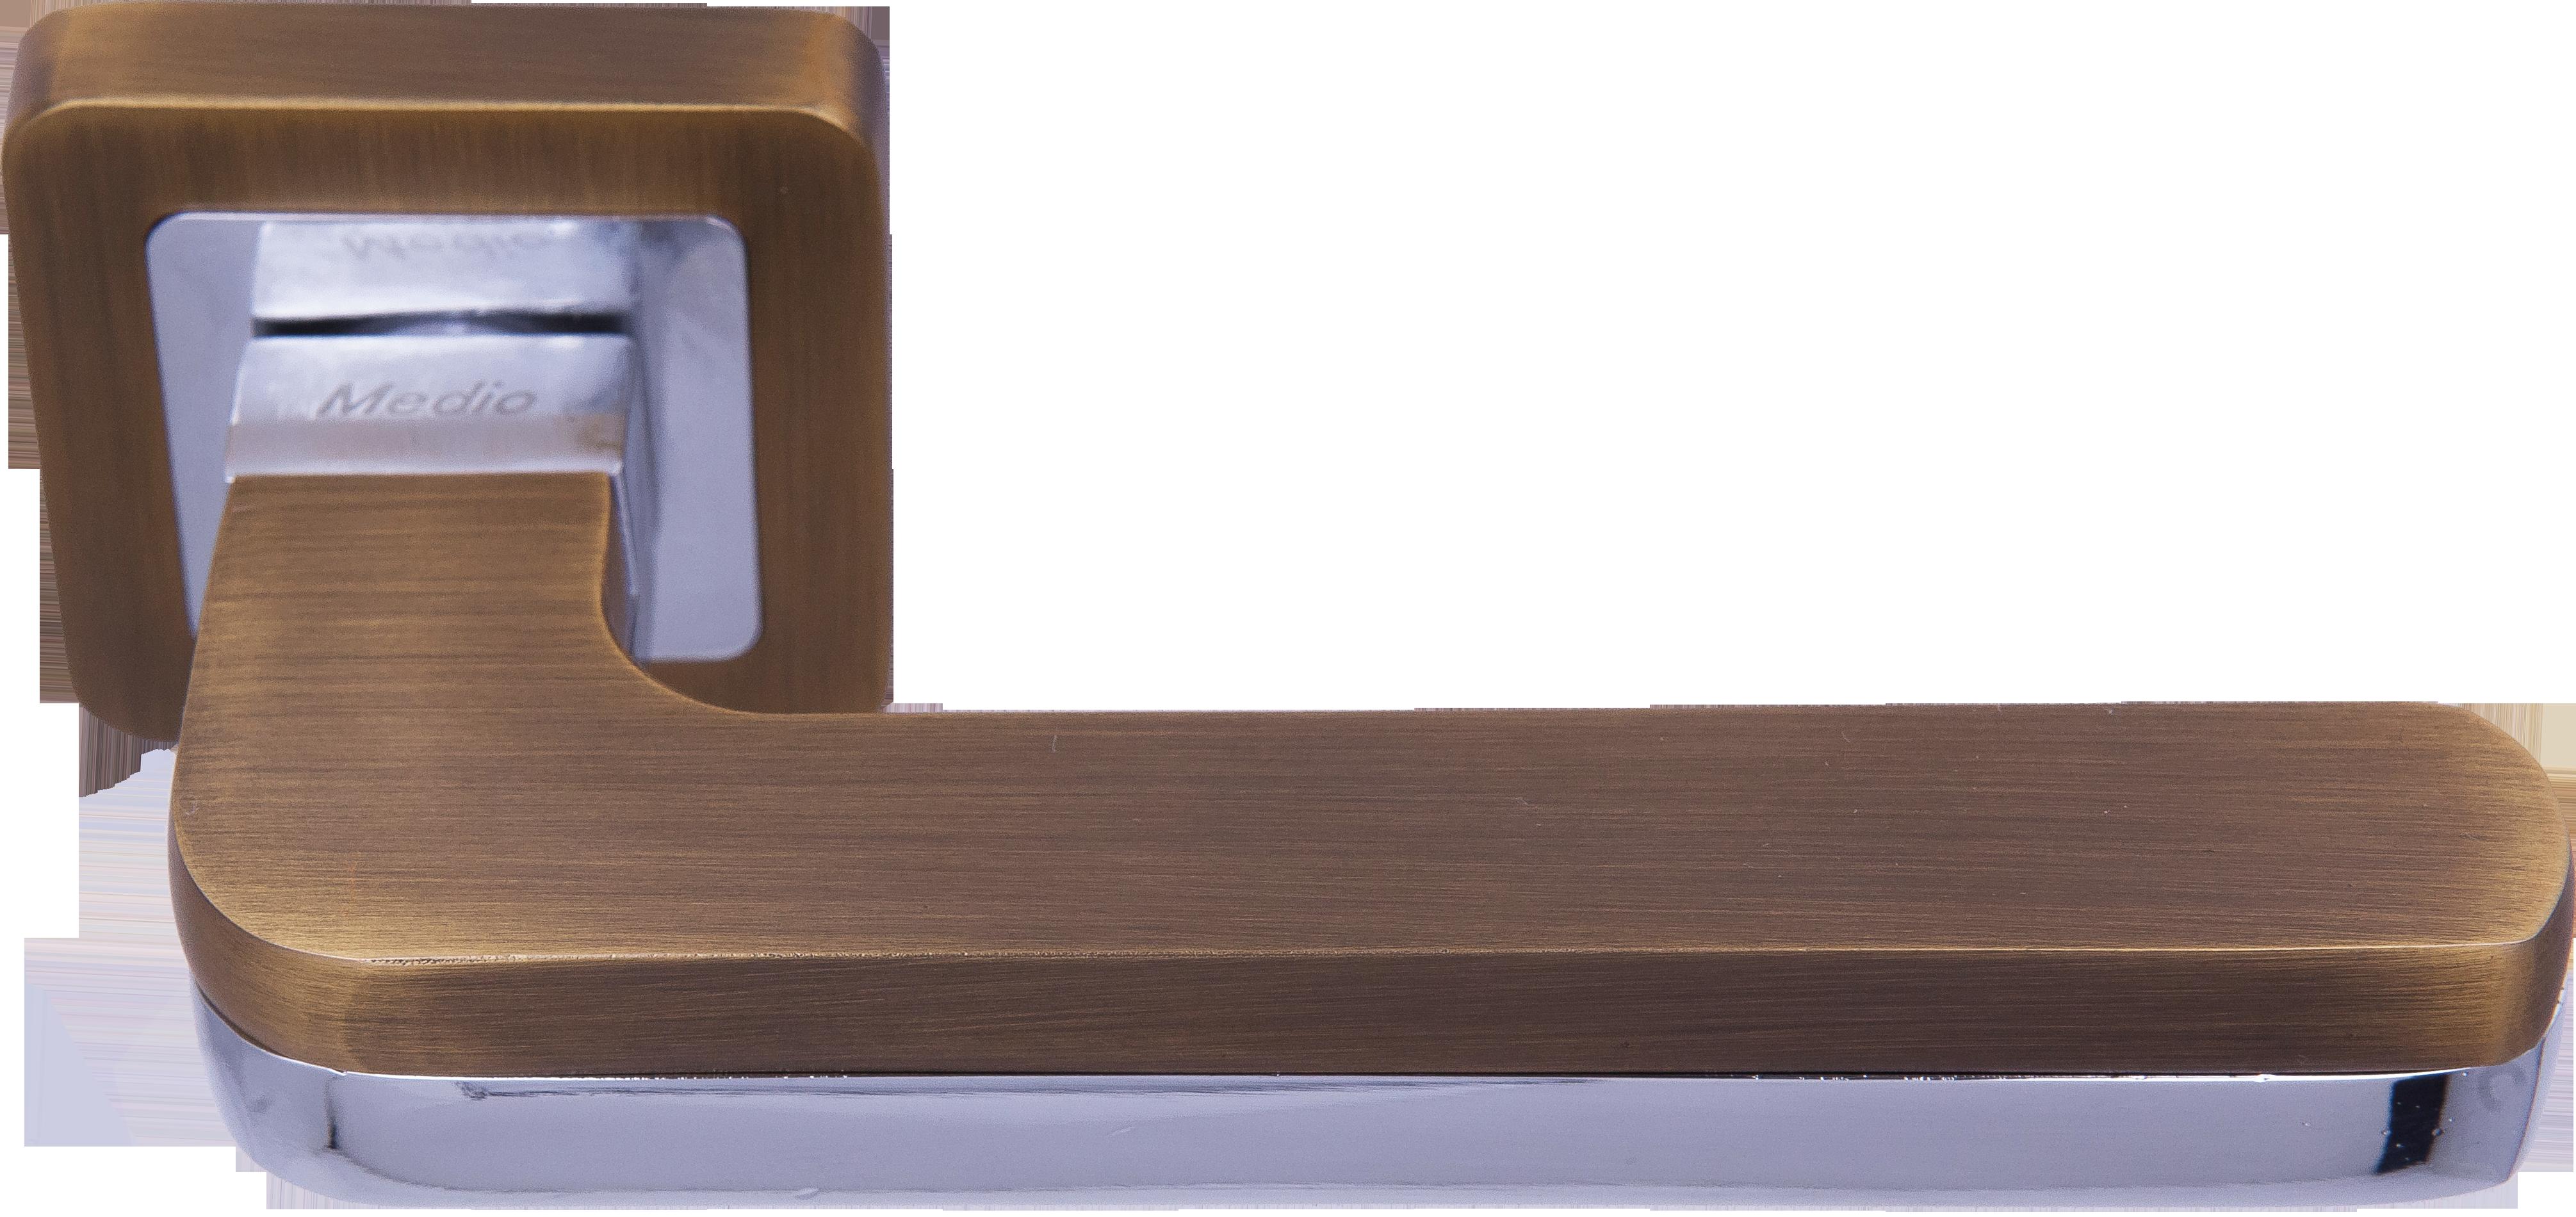 Ручка Медио ML7032-78 GF-G/CP кофе/хром (20 шт)